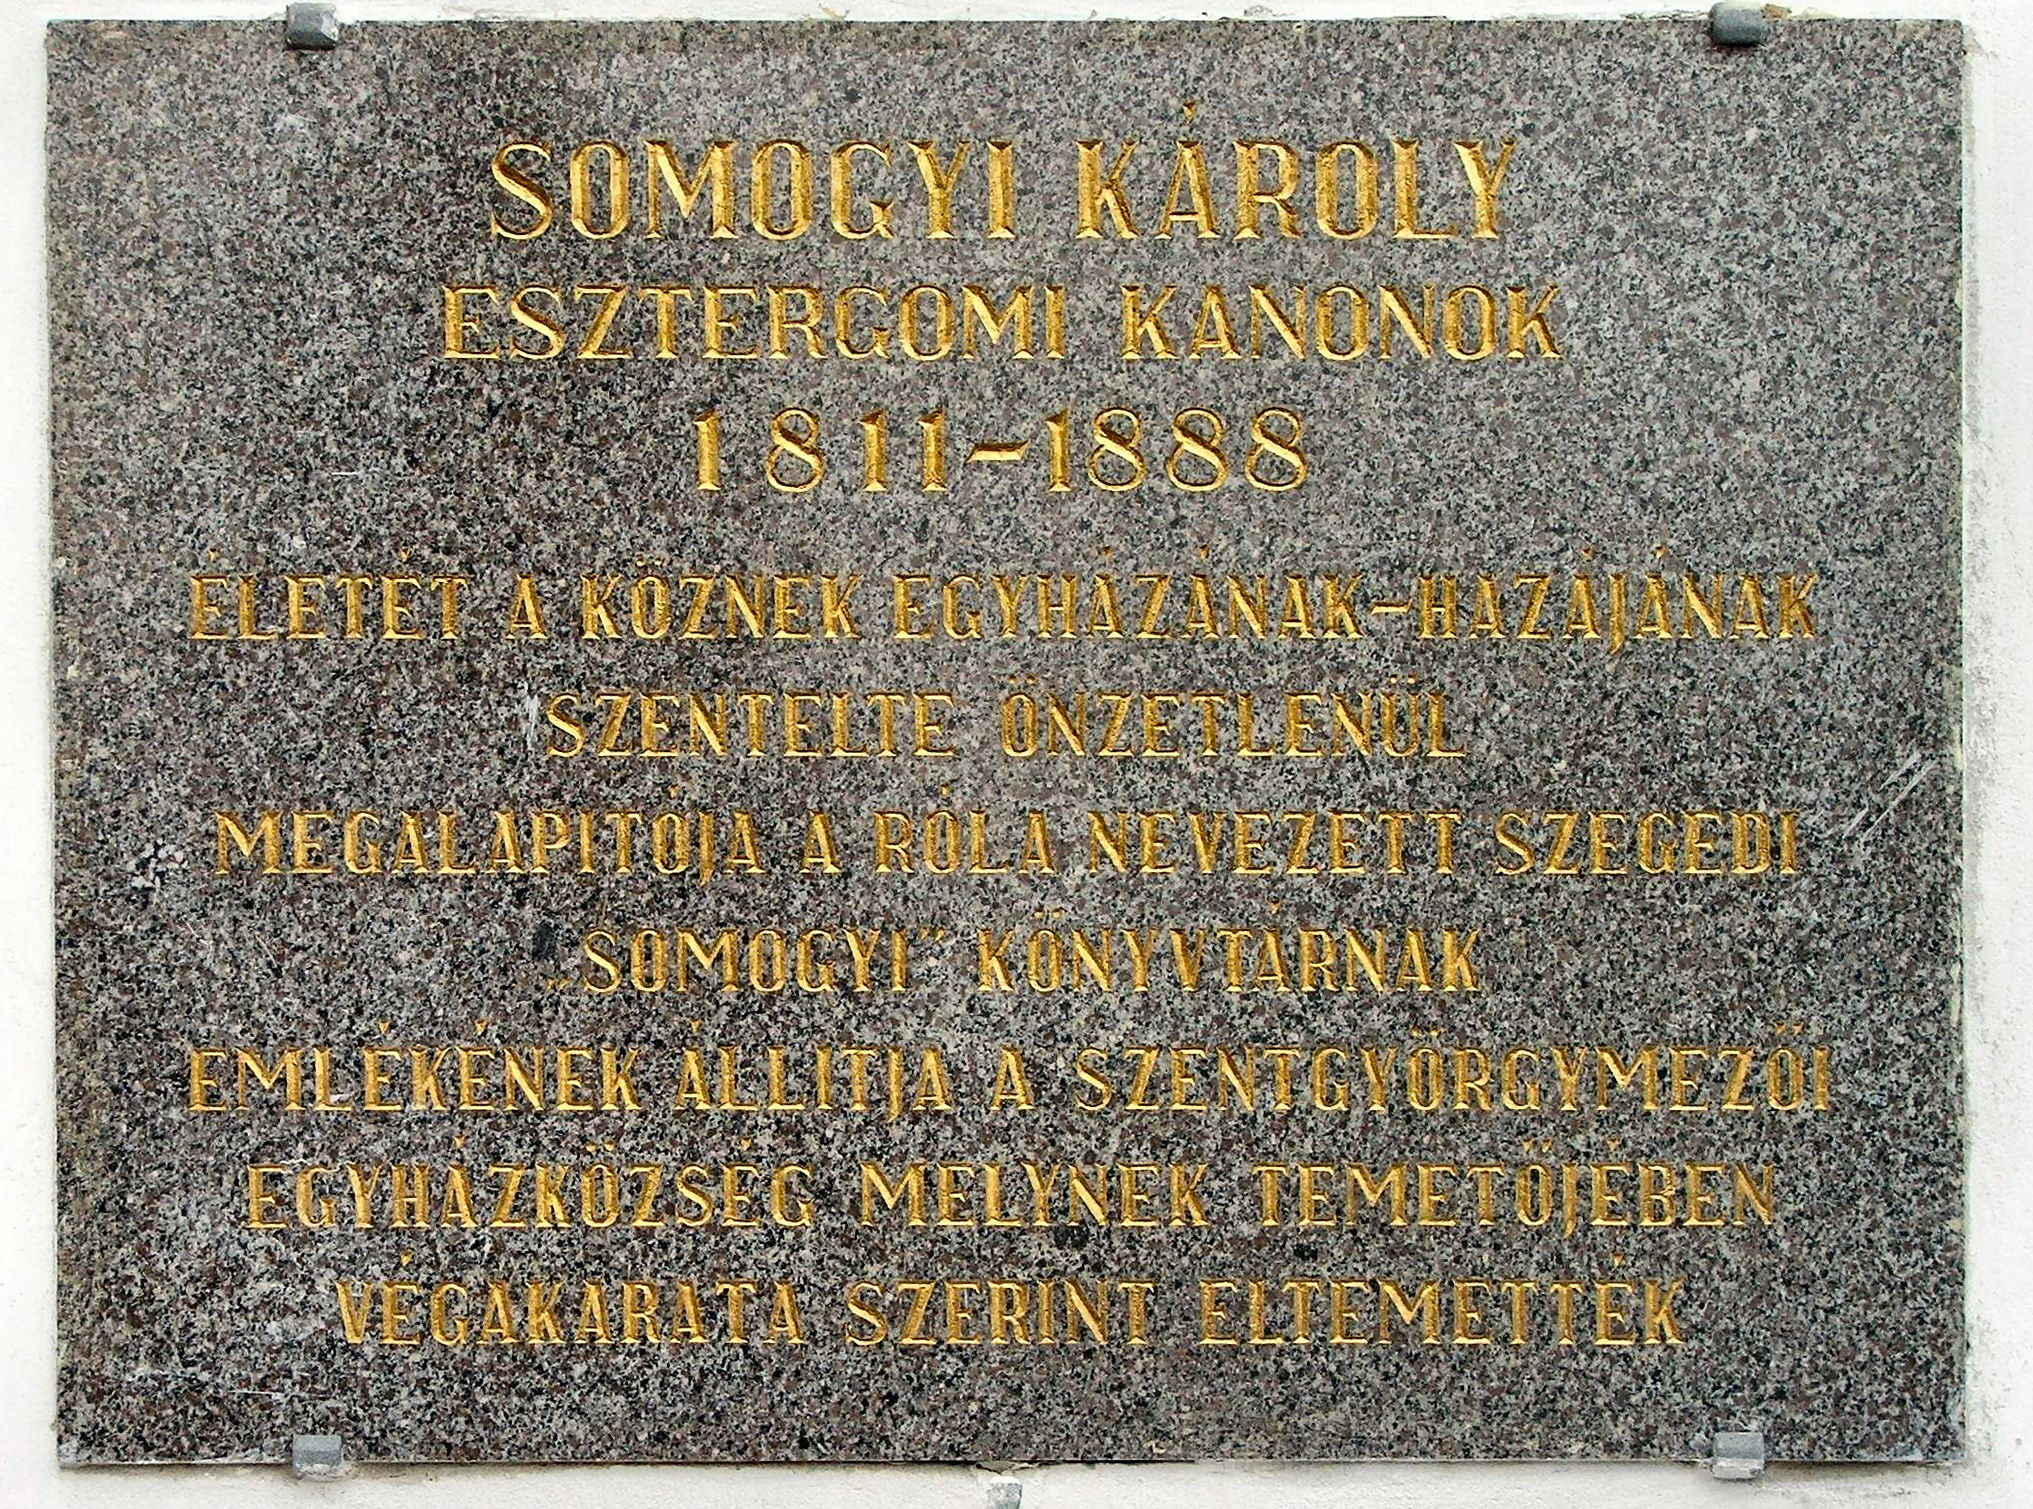 Somogyi Károly síremléke (http://upload.wikimedia.org/wikipedia/commons/2/21/Esztergom_-_Somogyi_Karoly_emlektabla.JPG)